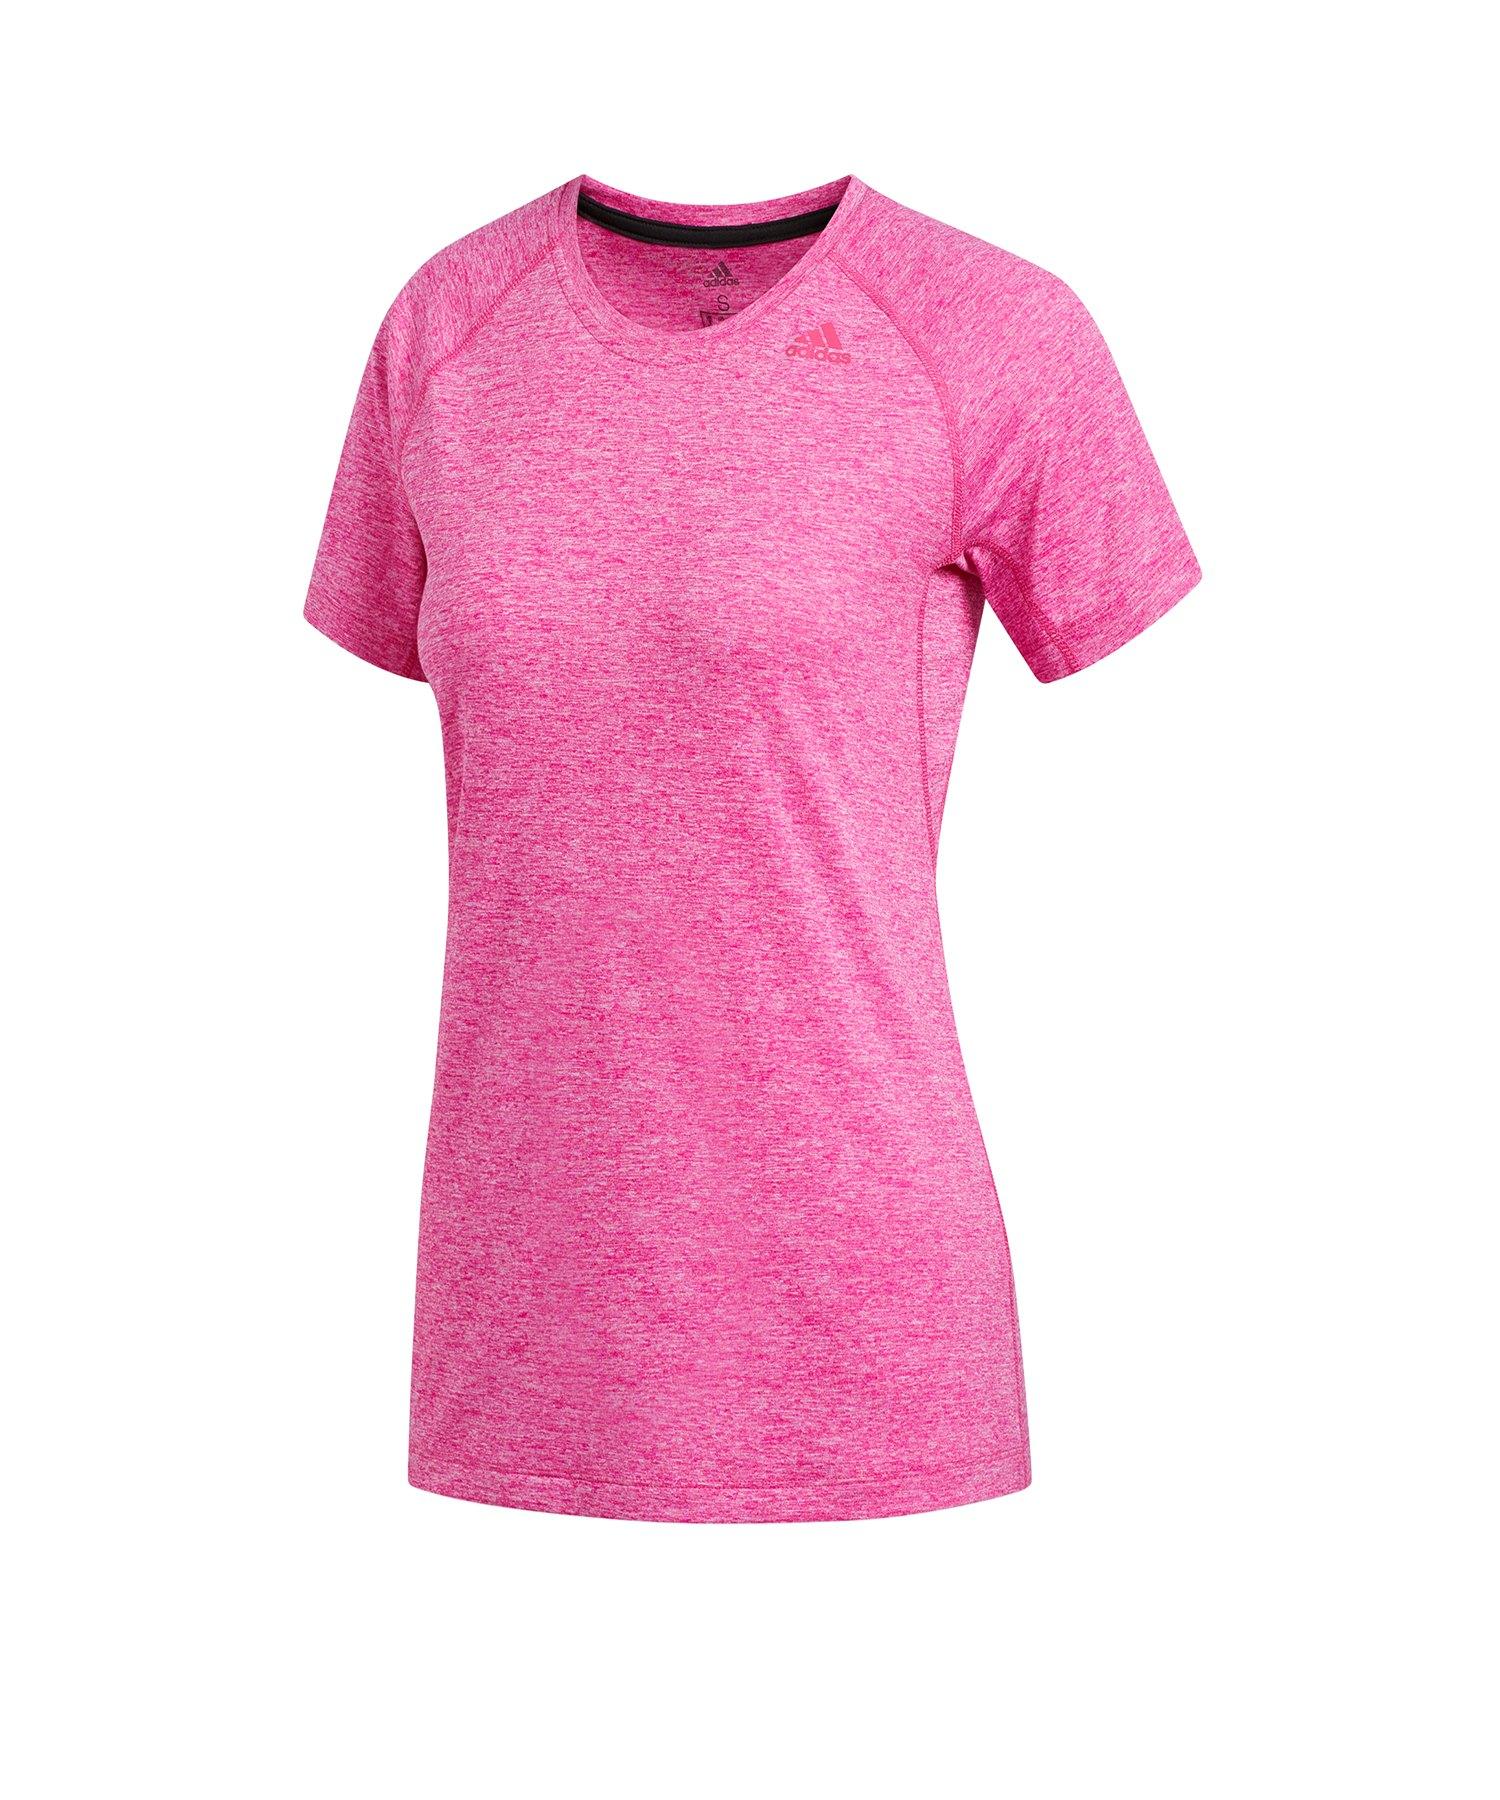 fb74d944ad1507 adidas Tech Prime 3S T-Shirt Running Damen Rosa - rosa